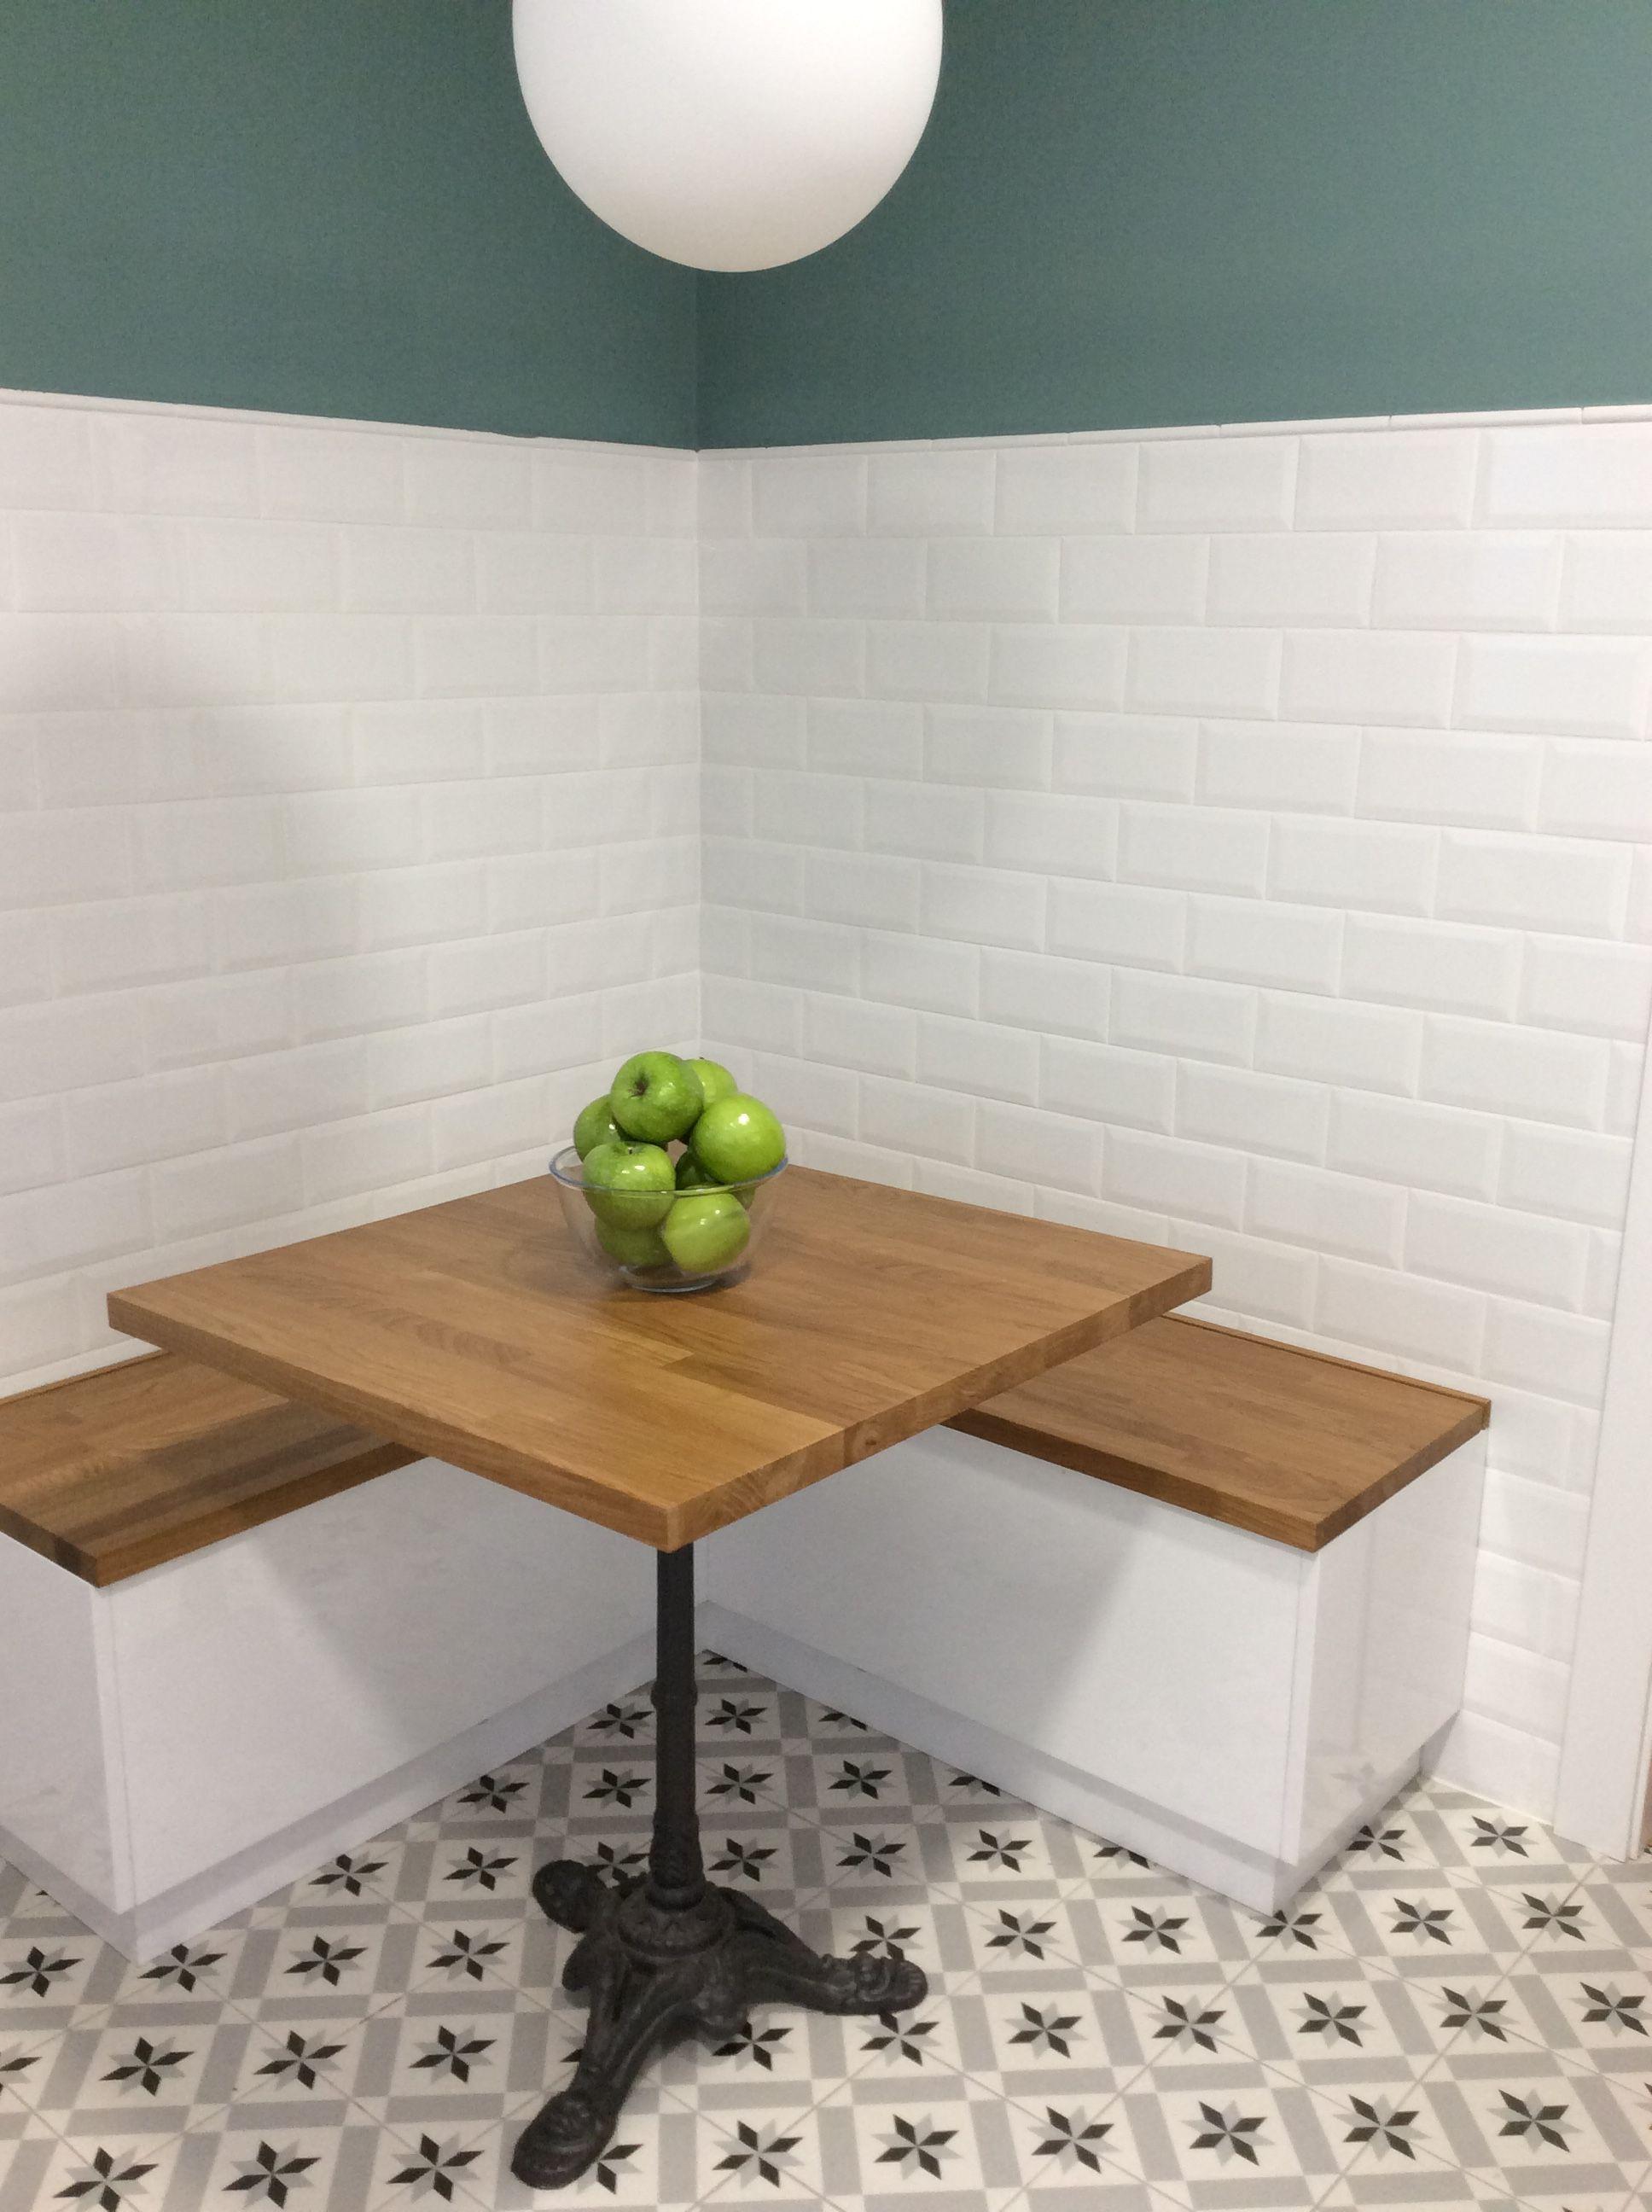 Rincones para compartir mesa de cocina con bancos de - Bancos para cocina modernos ...